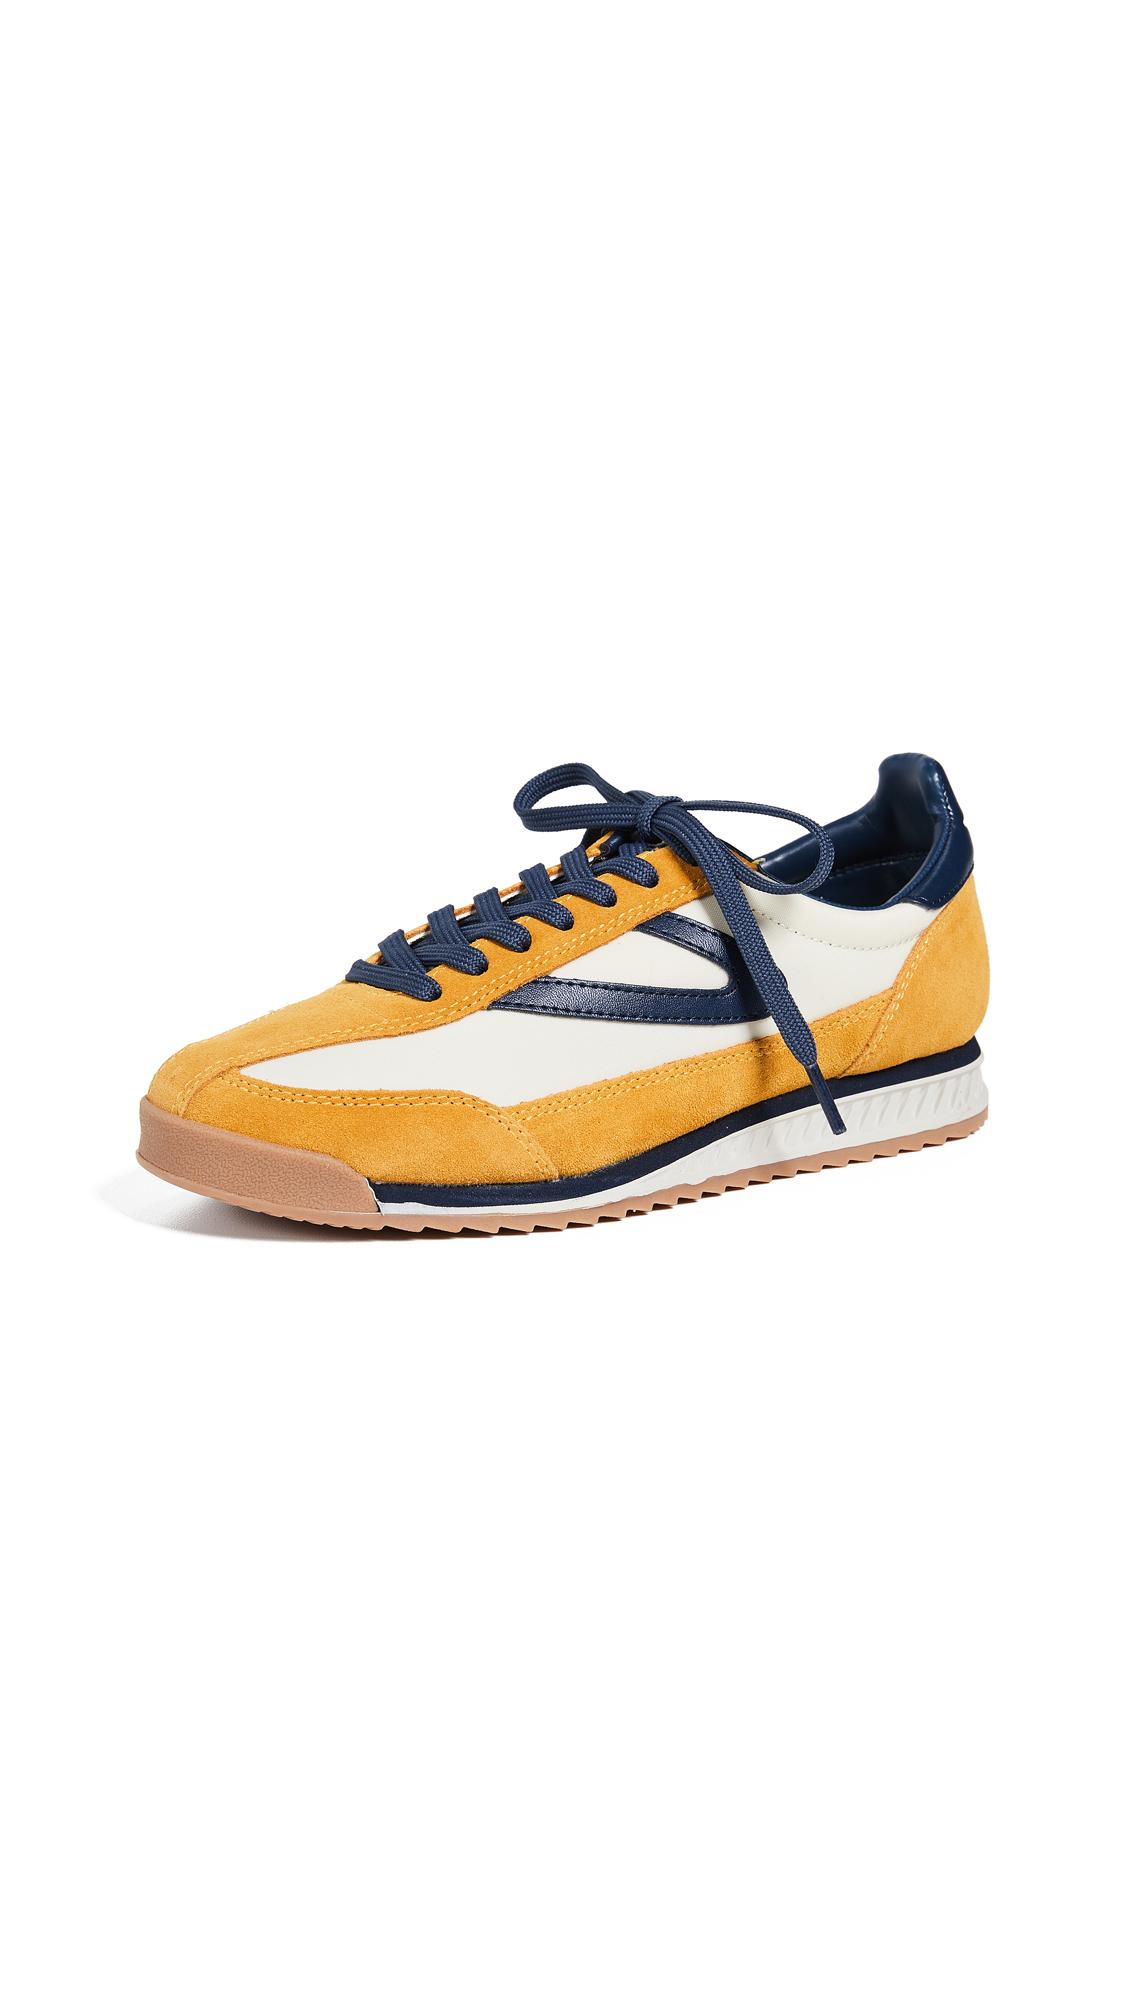 Tretorn Rawlins III Jogger Sneakers - Lemon/Ice/Night